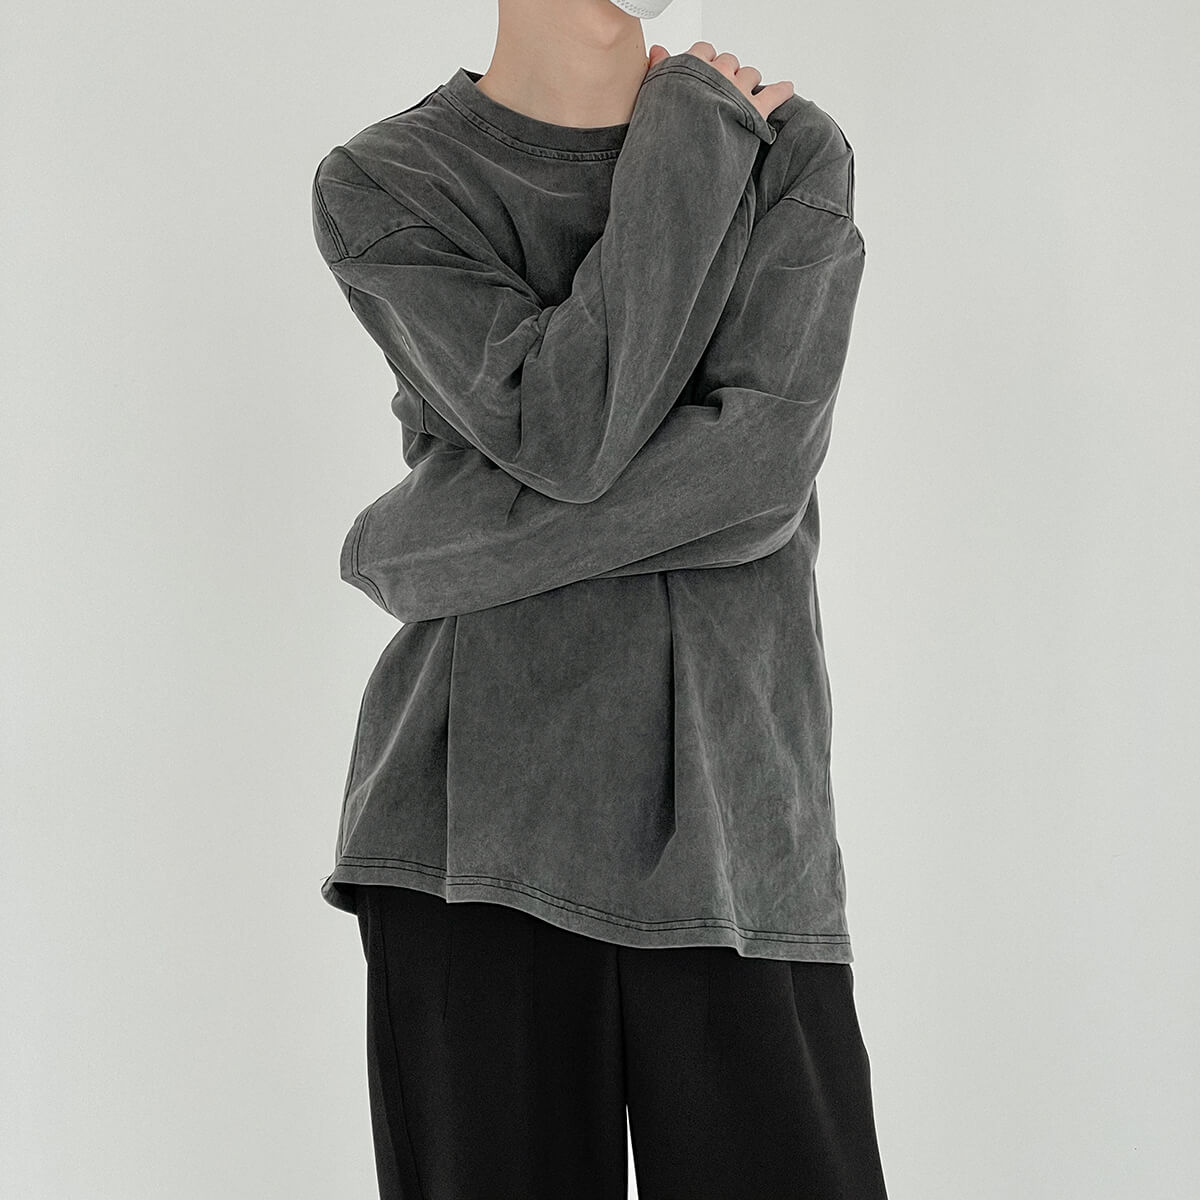 Лонгслив DAZO Studio Sweatshirt Grunge Shade (4)